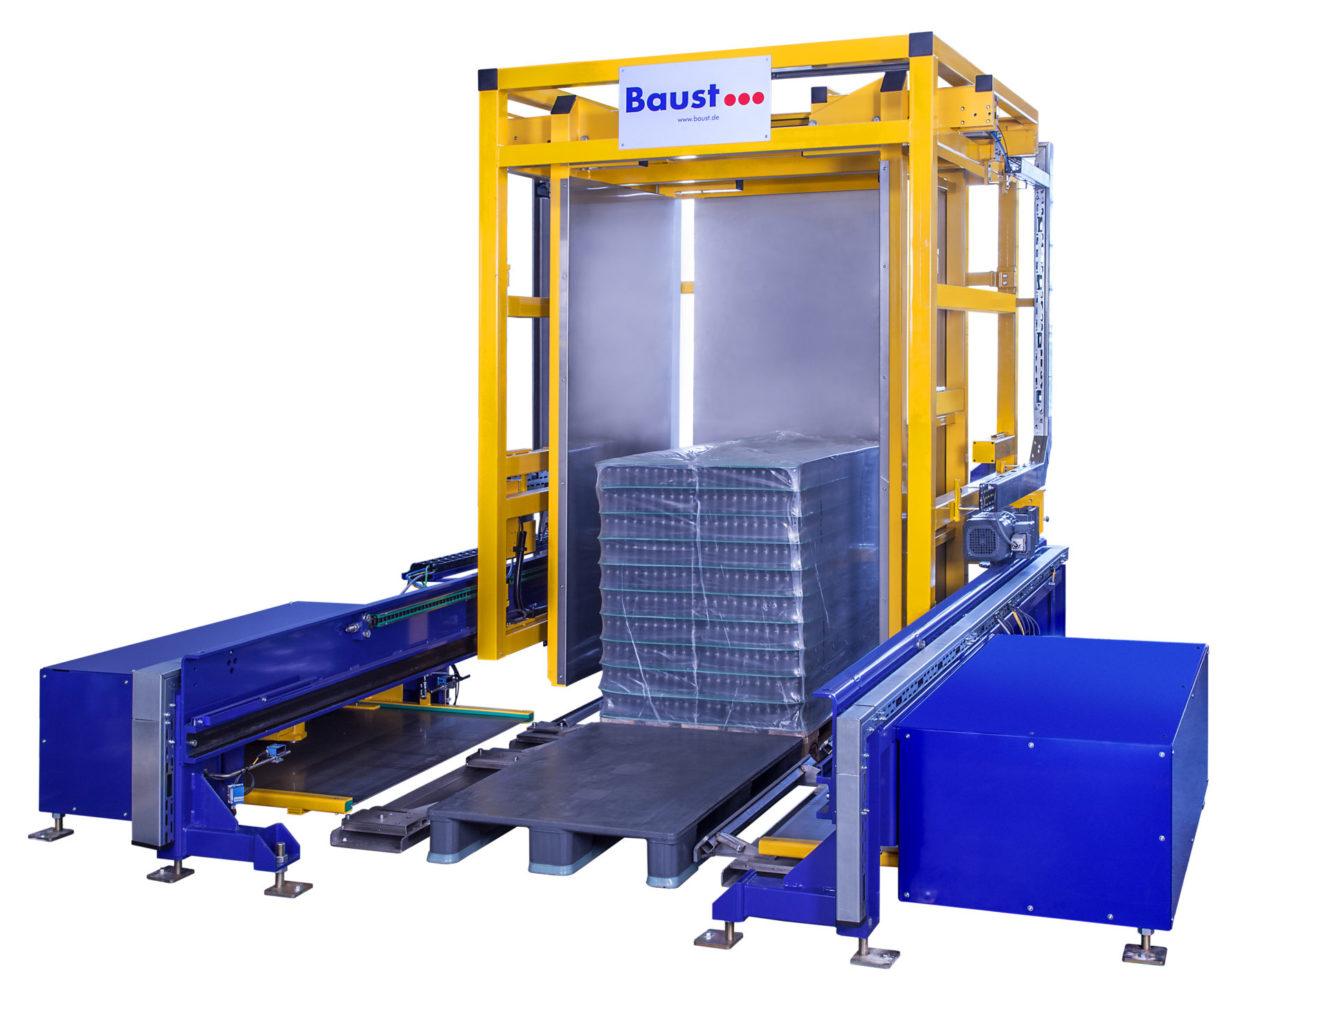 Pw 2000 Palettenwender Foerdertechnik Logistik Systeme Lager Management Baust Materialflusssysteme